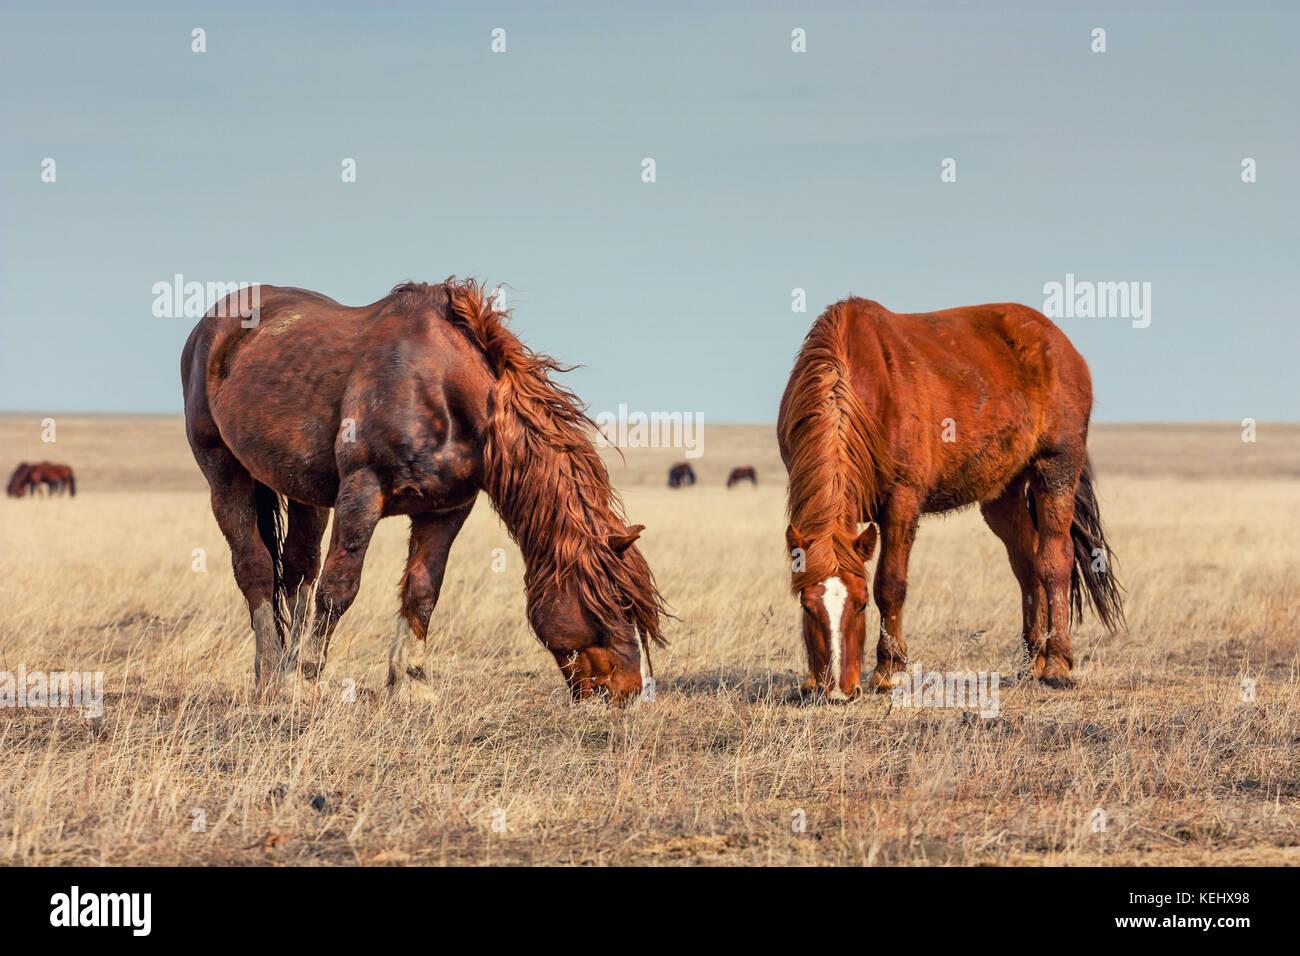 Wild horses in prairie - Stock Image